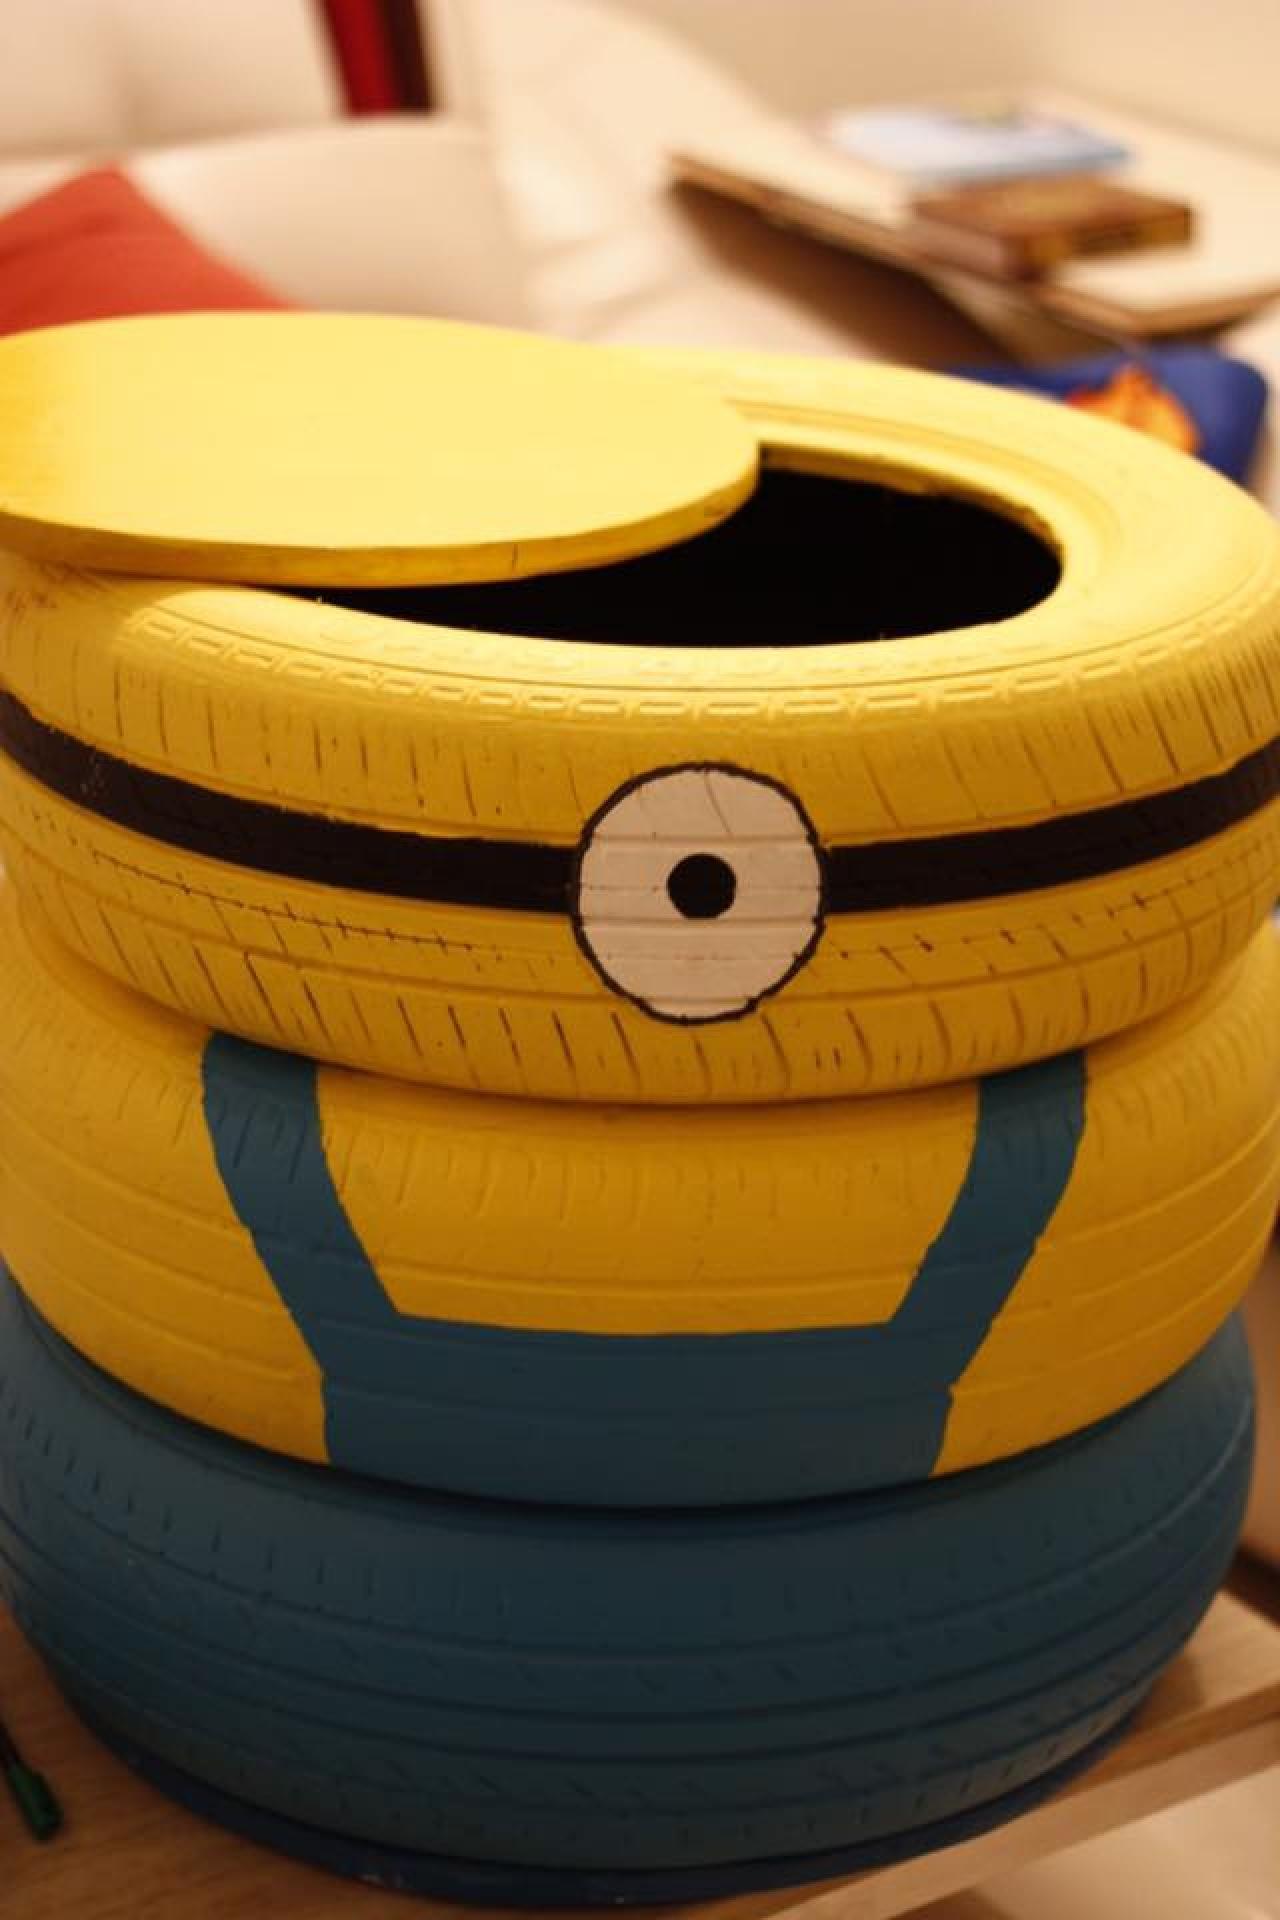 Re. Tire利用廢棄輪胎,加上自己的創意,製作出minions造型的儲物箱。(Re. Tire Facebook)